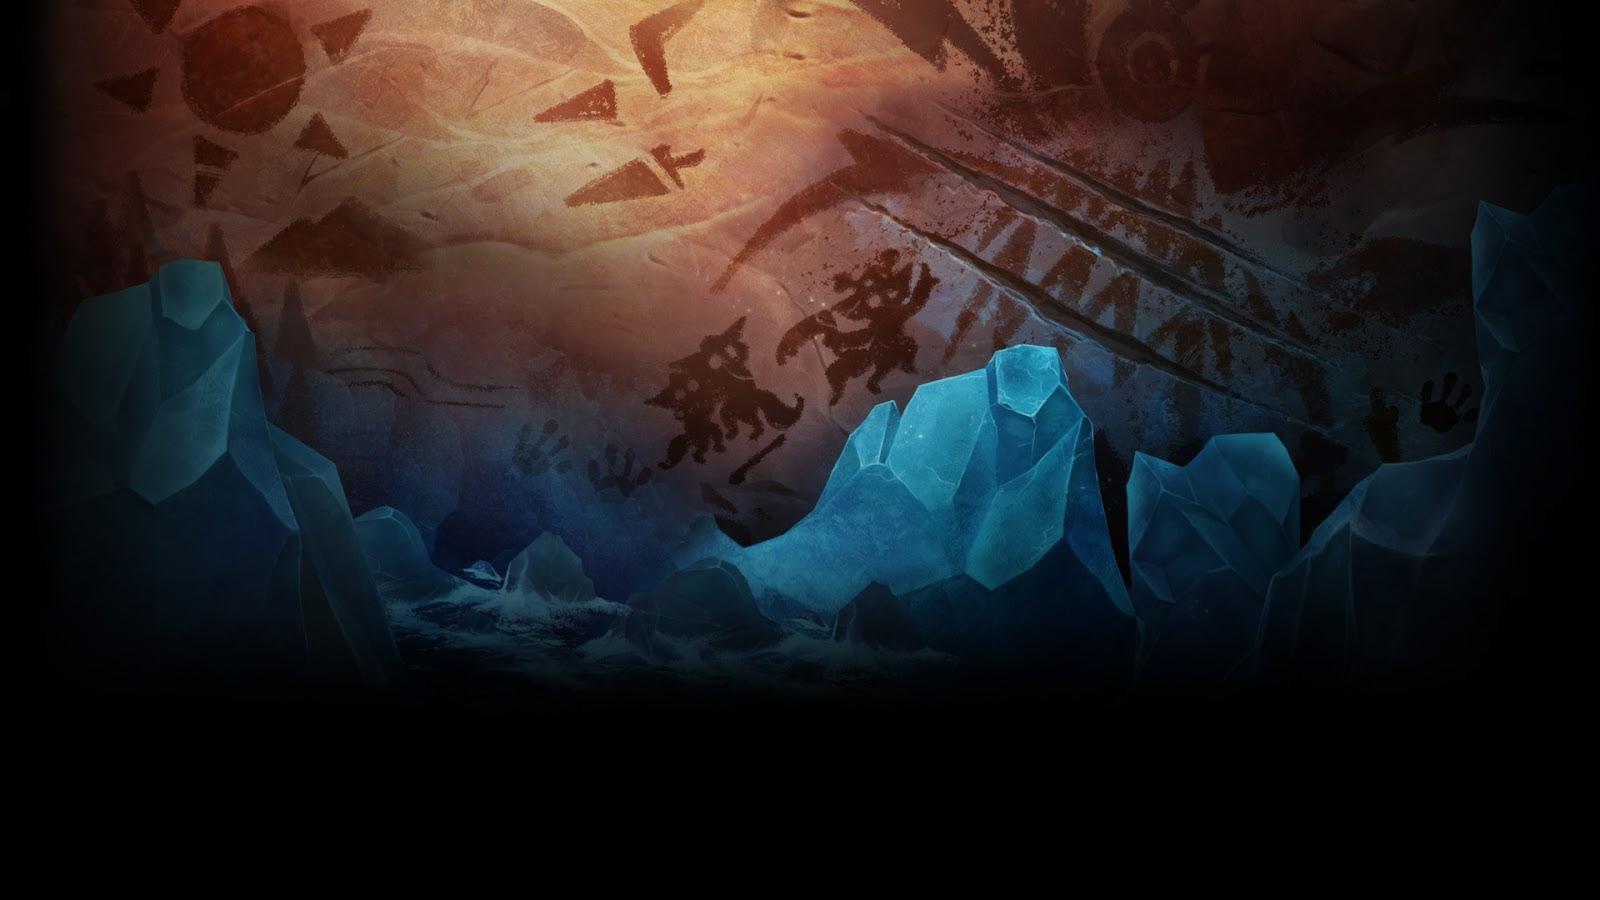 Gnar Teaser Background League Of Legends Wallpapers